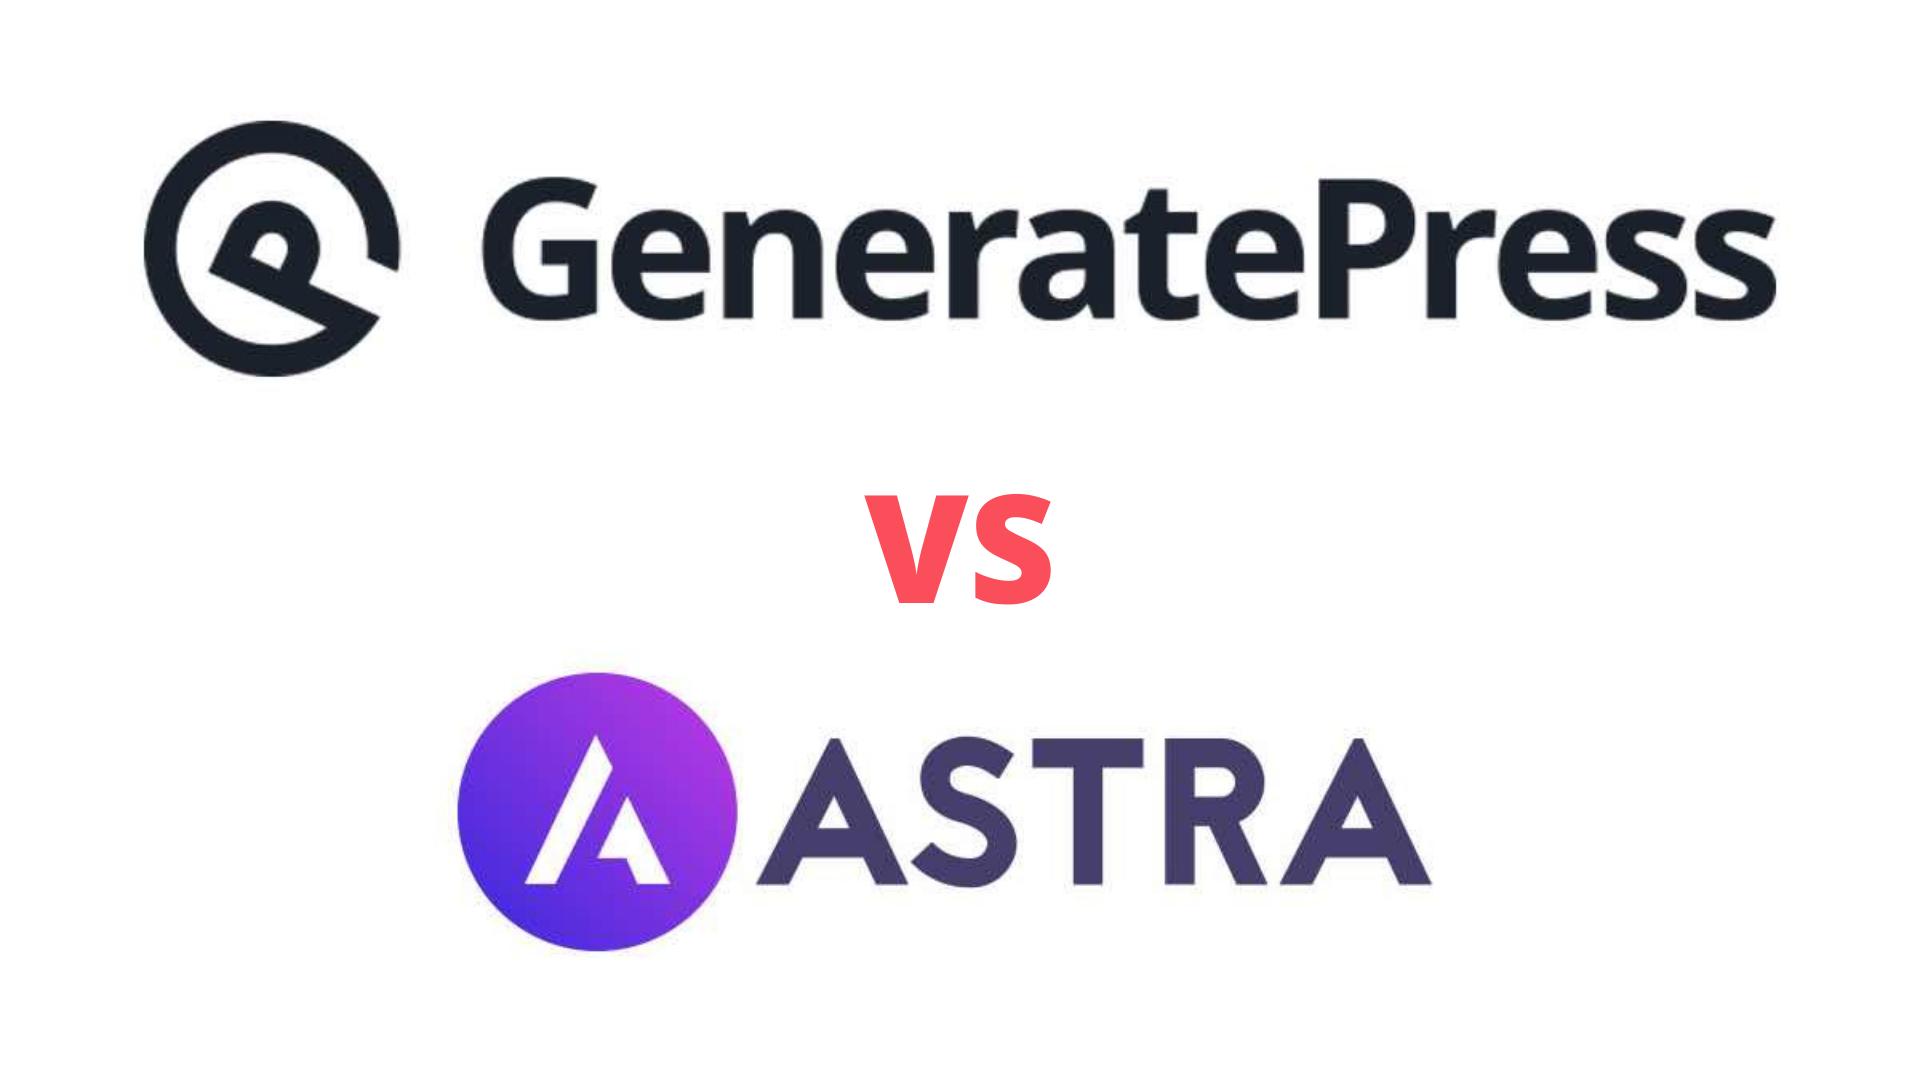 ¿GeneratePress o Astra? Comparamos ambos temas de WordPress